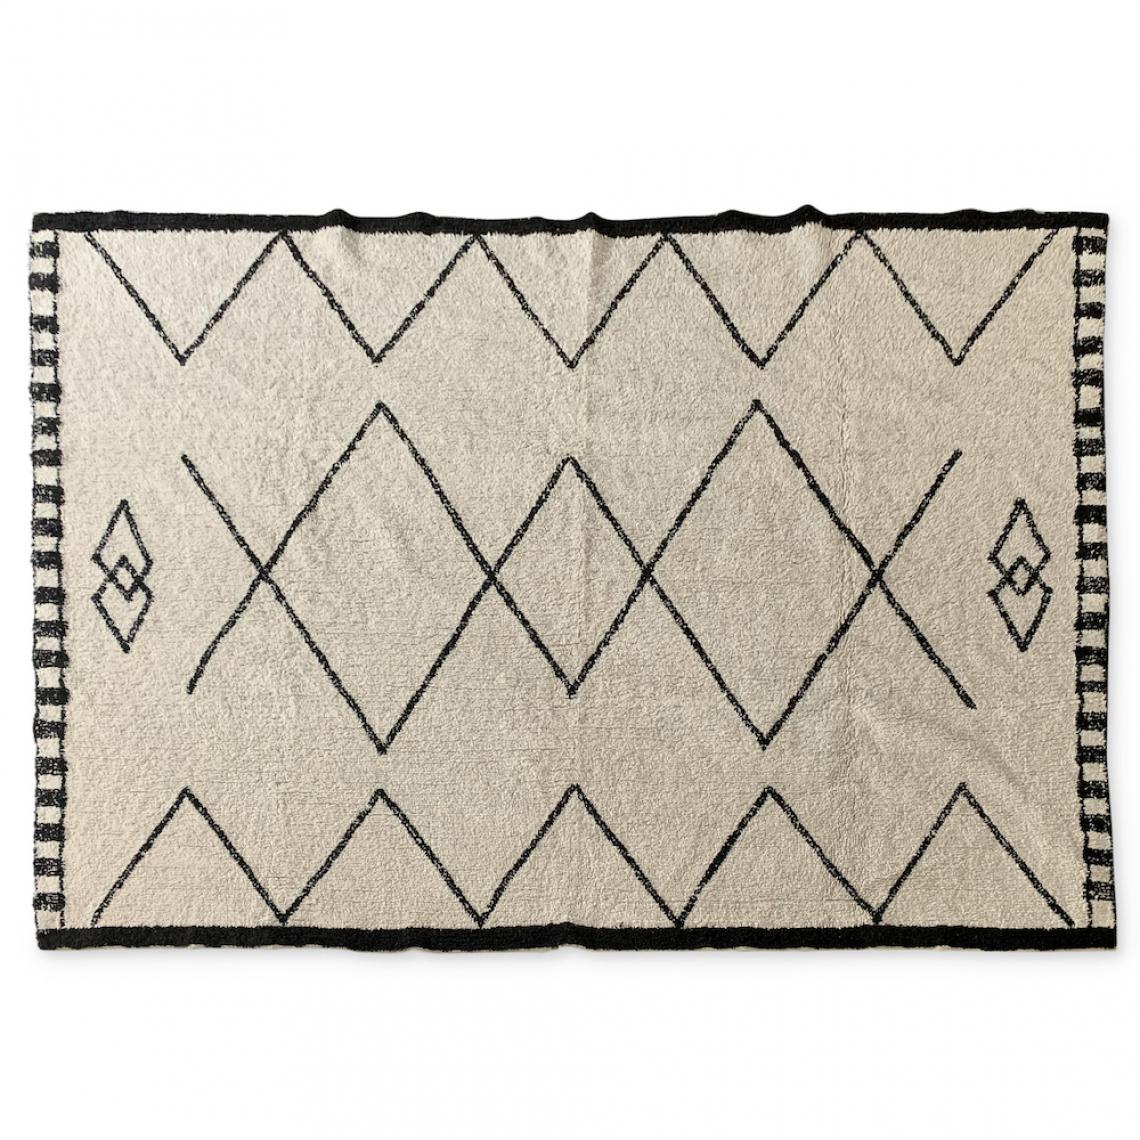 tapis berbere artisanal noir et blanc bouazza 160 x 230 cm